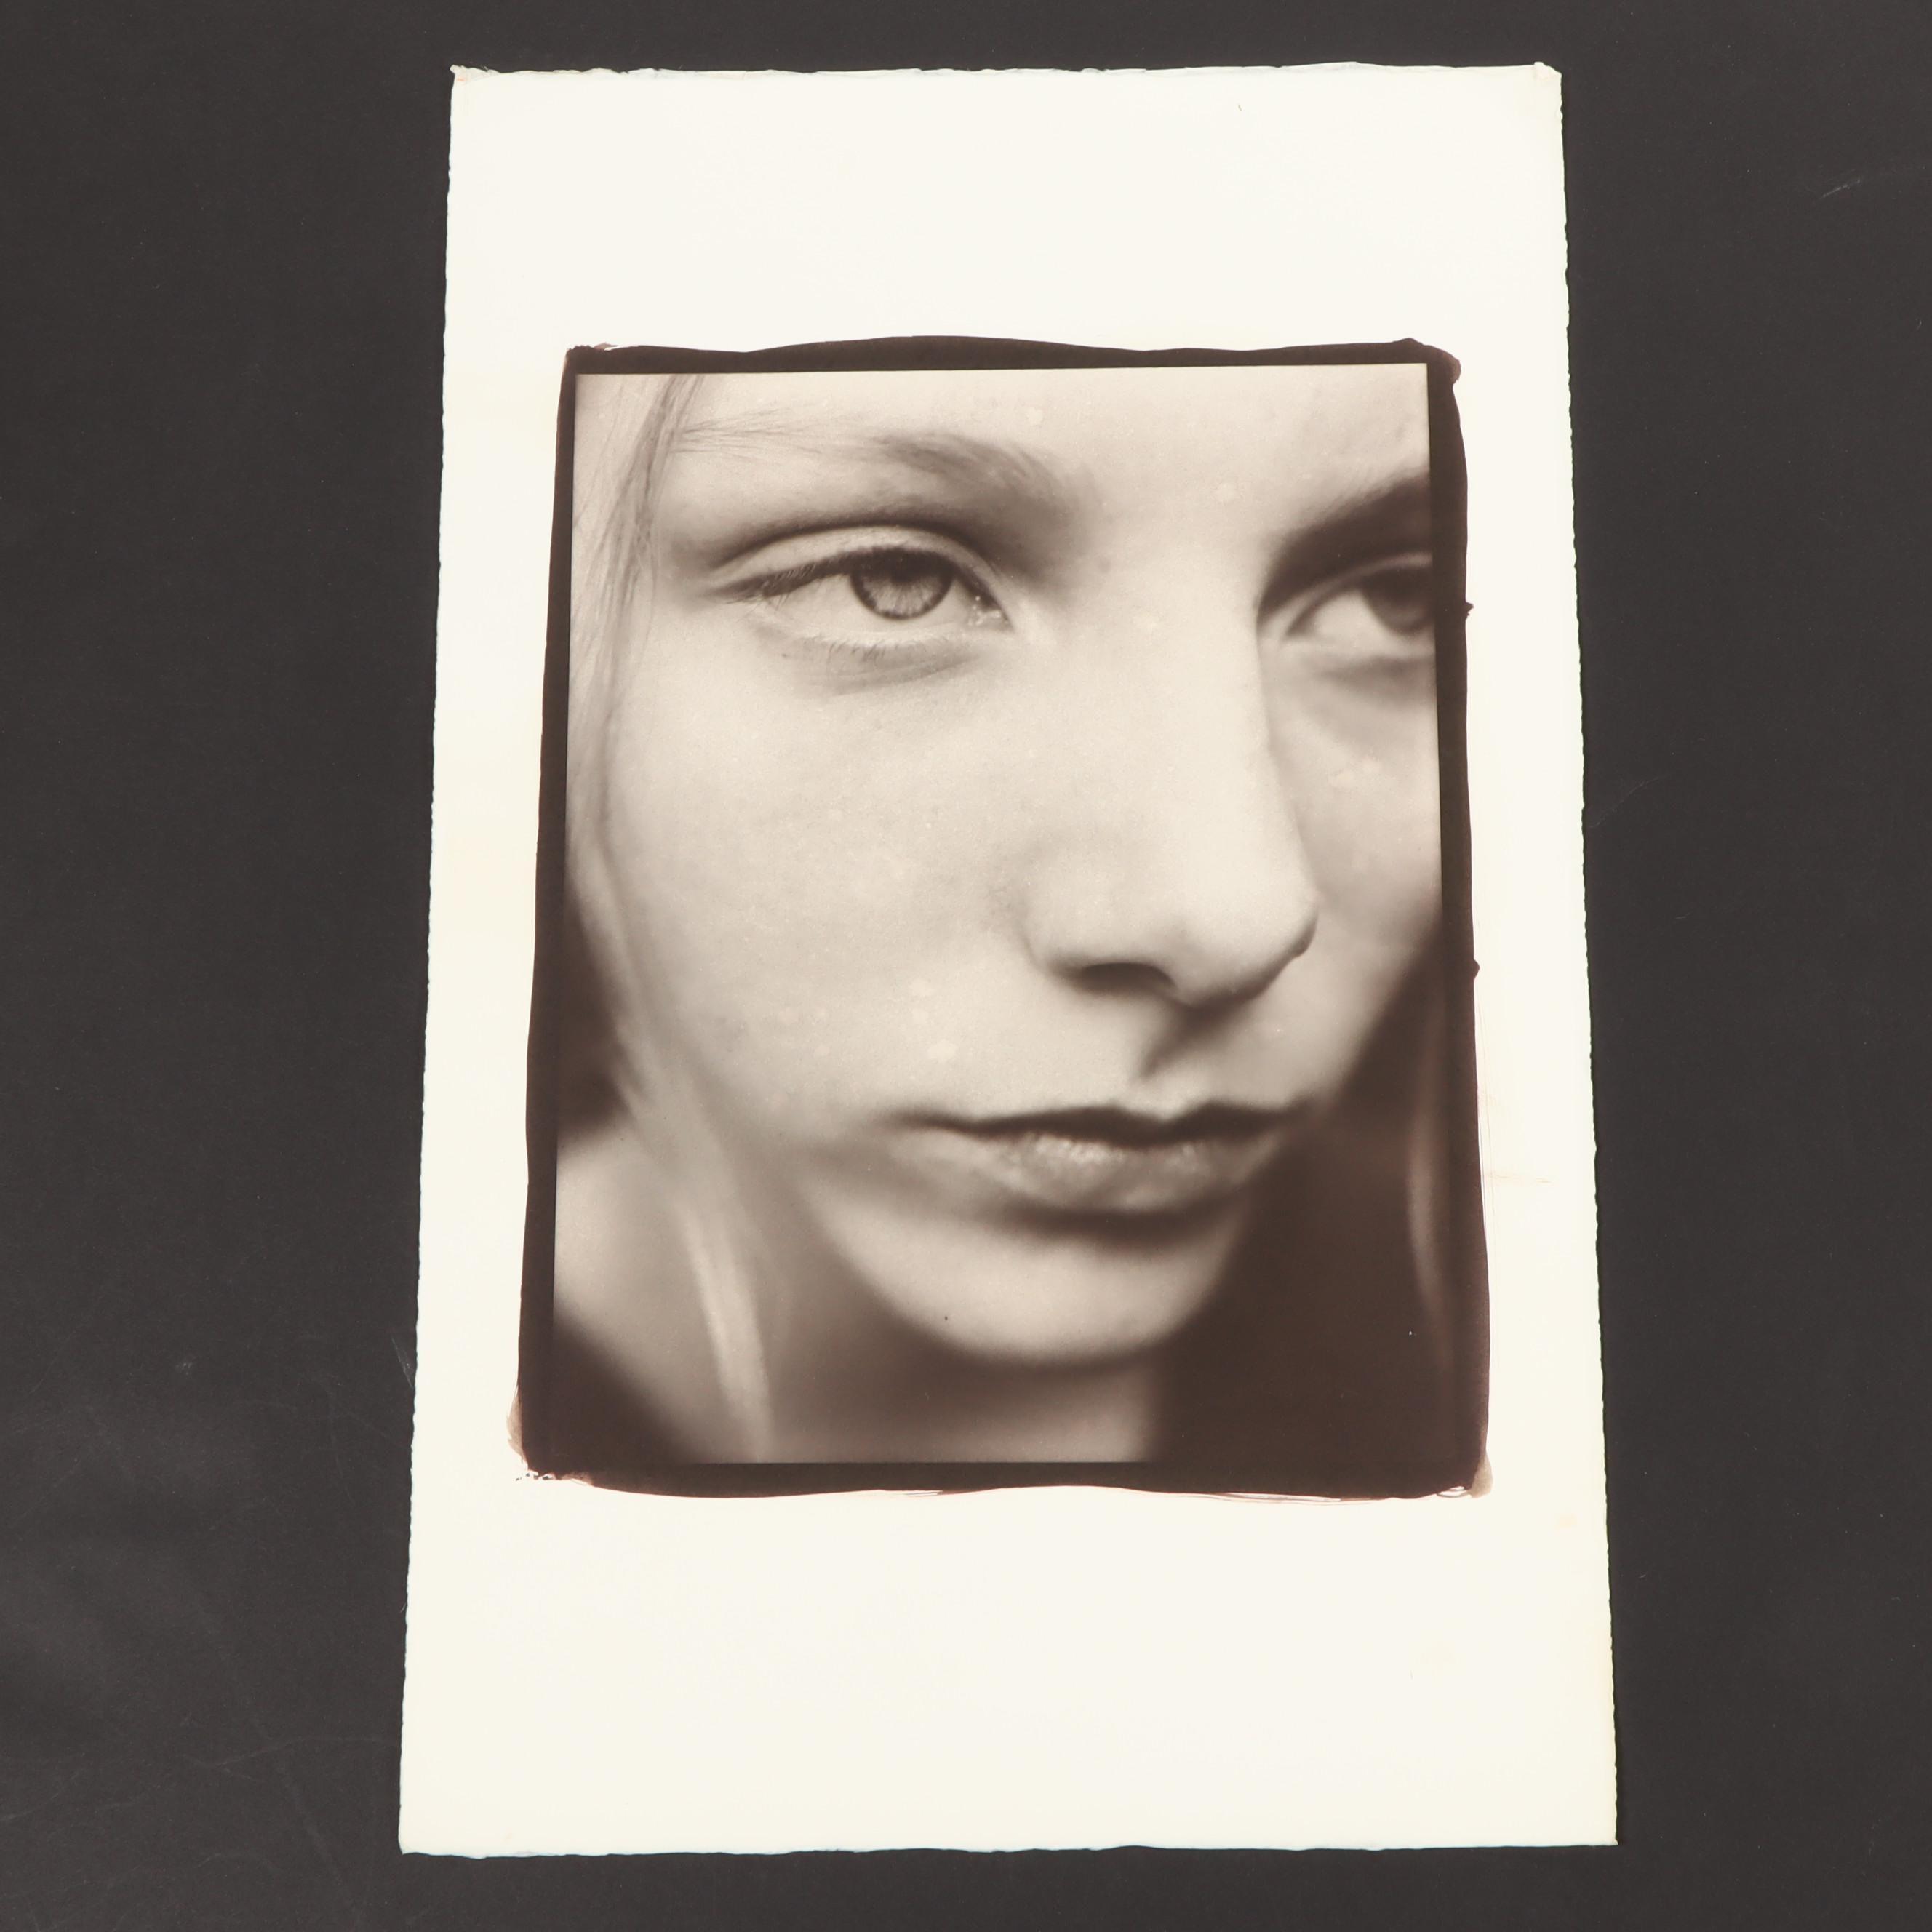 "Adam Jernigan Digital Photograph ""Reflections of Childhood"" Series"